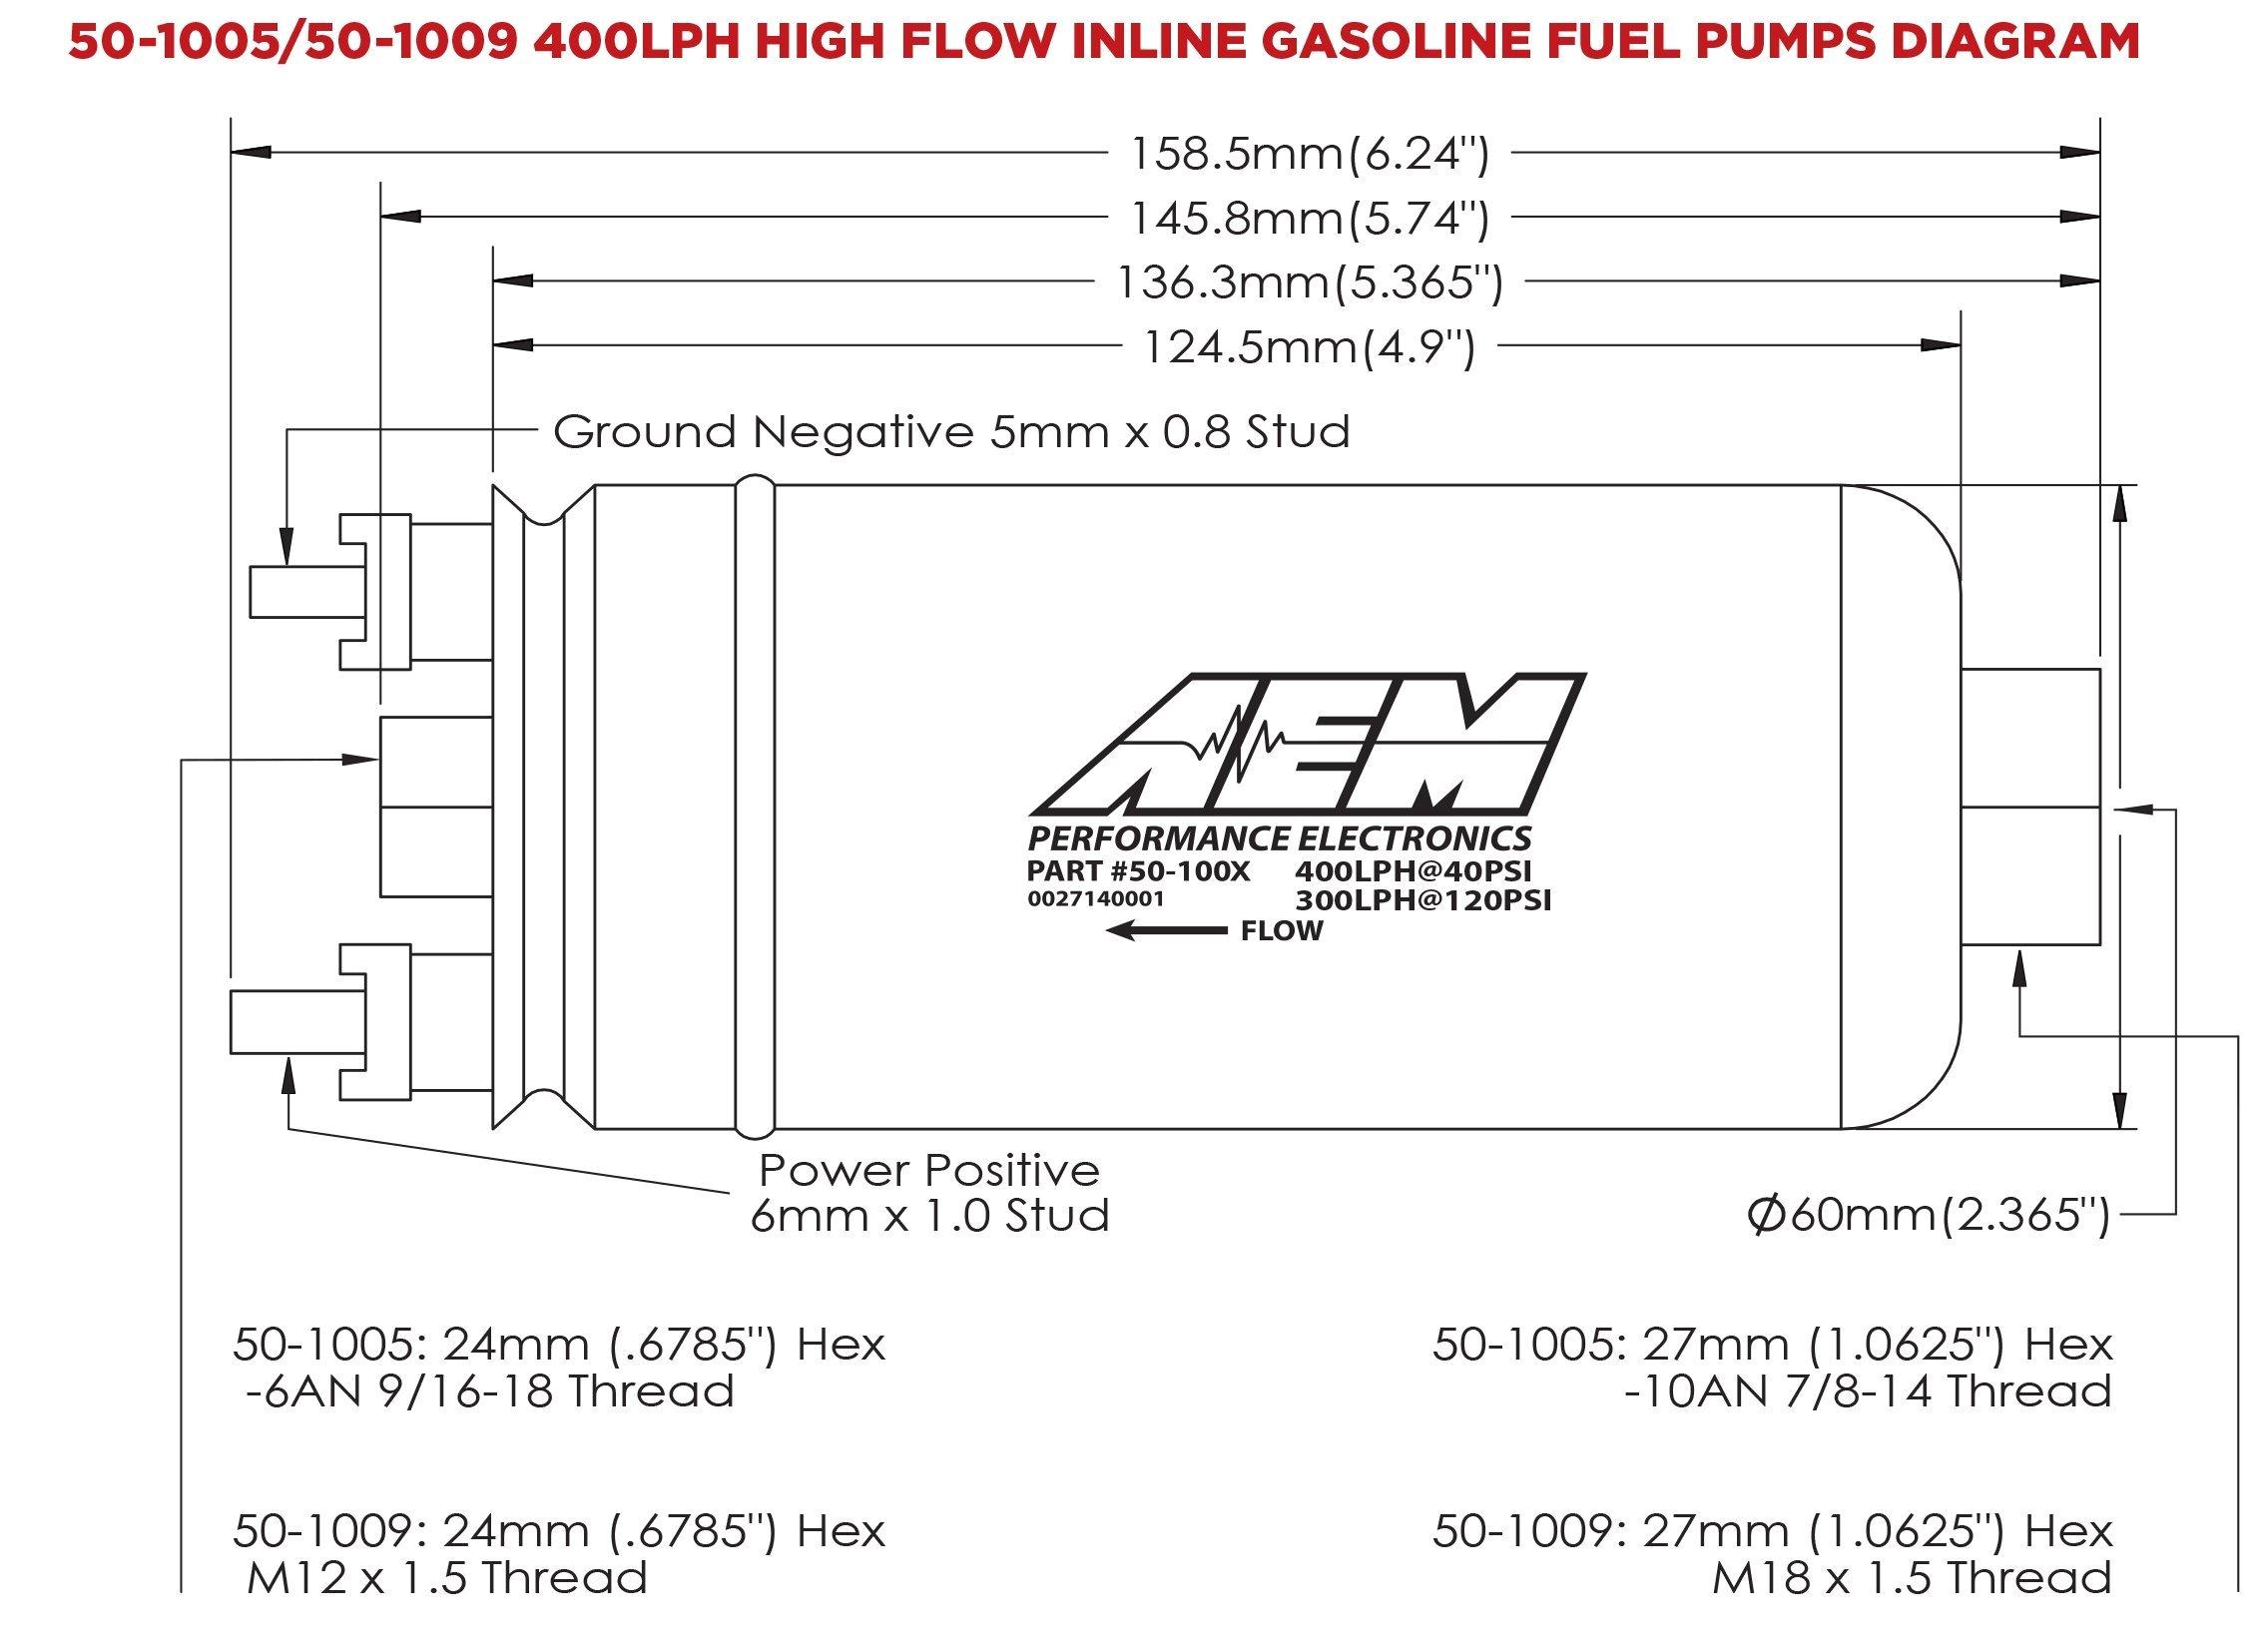 Aem Air Fuel Ratio Gauge Wiring Diagram Aem 400lph High Flow In Line Fuel Pump 50 1005